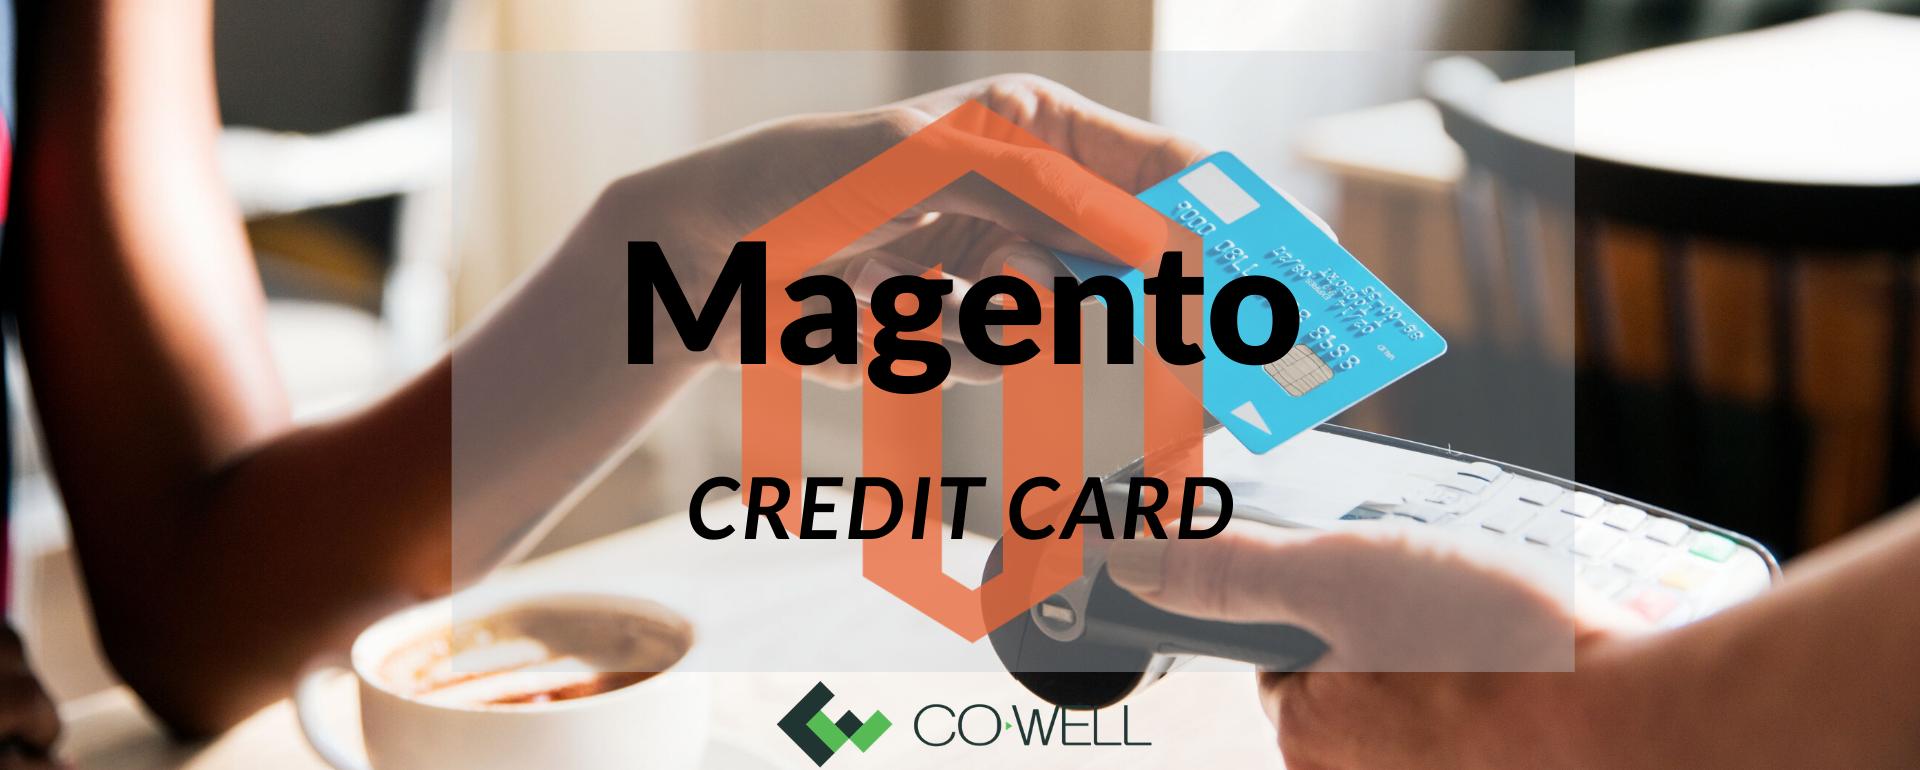 Magento credit card